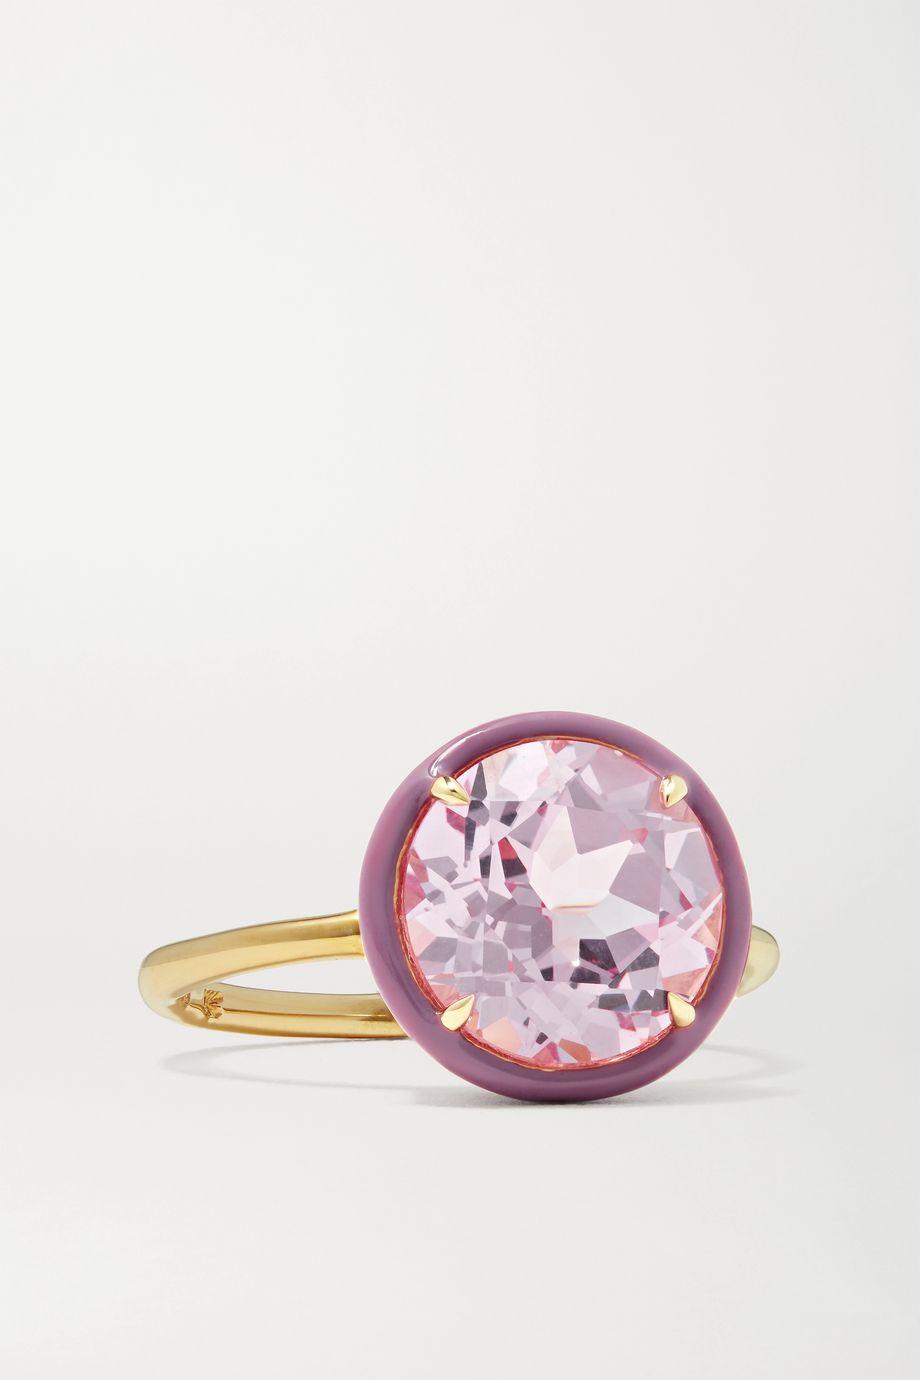 Alison Lou 14K 黄金、蓝宝石、搪瓷戒指